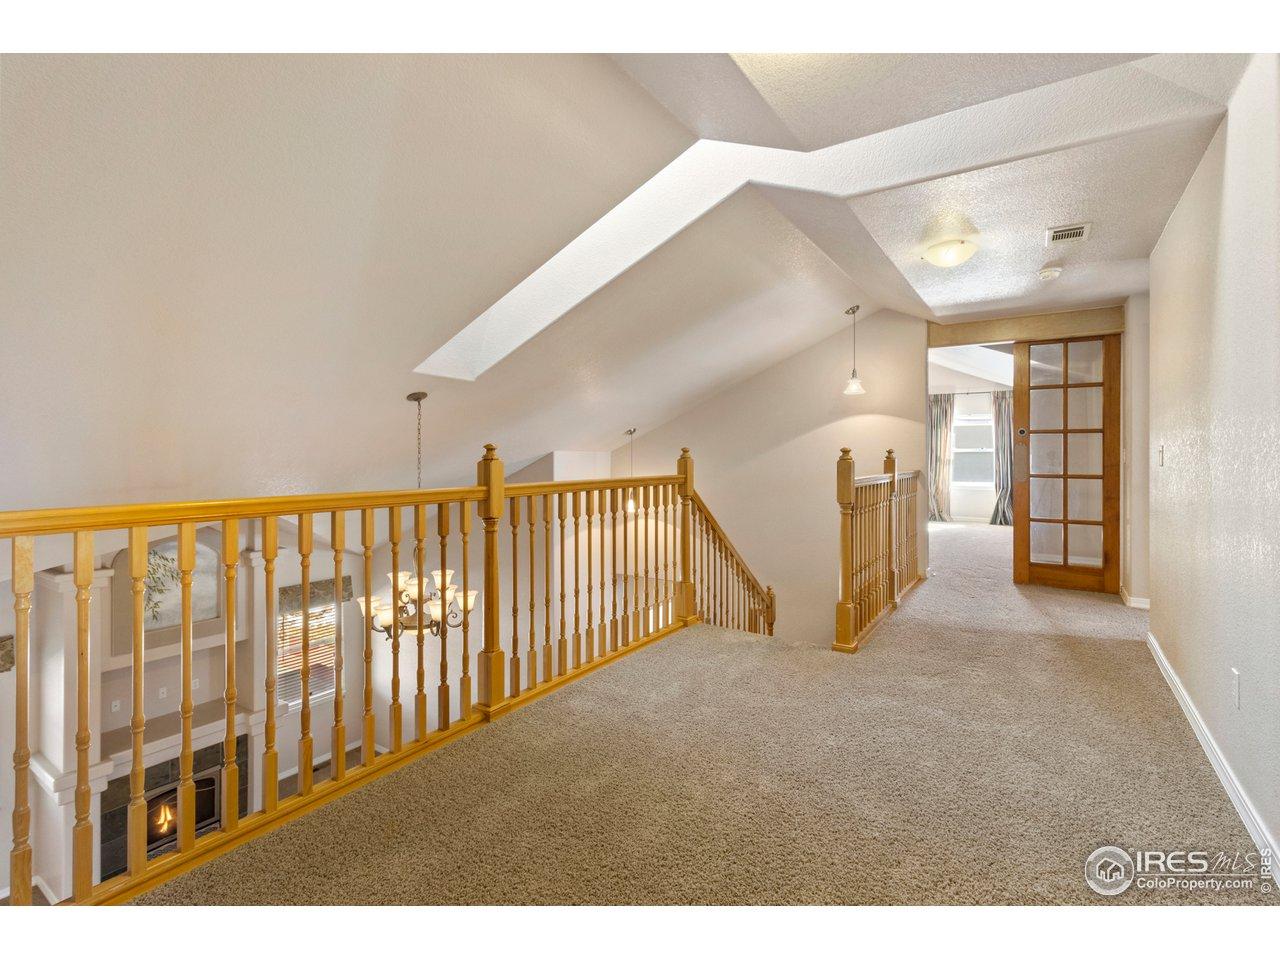 Loft and skylight